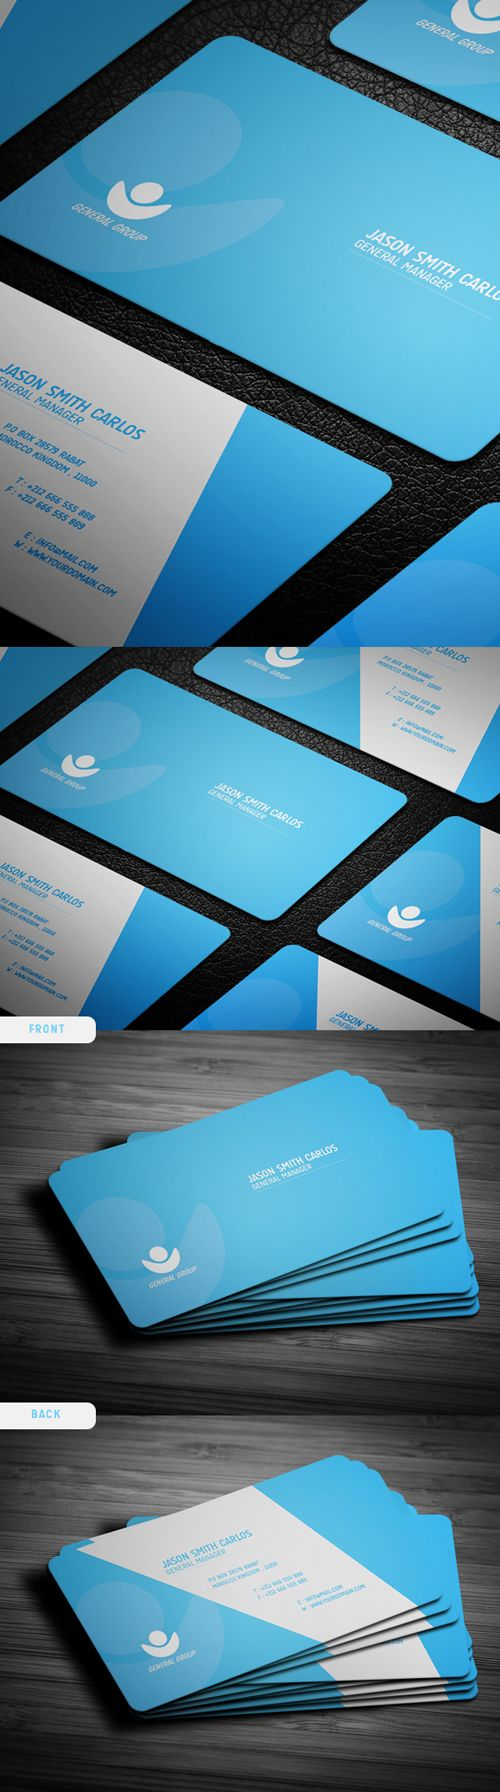 business cards template design - 12 #businesscards #businesscardtemplates…